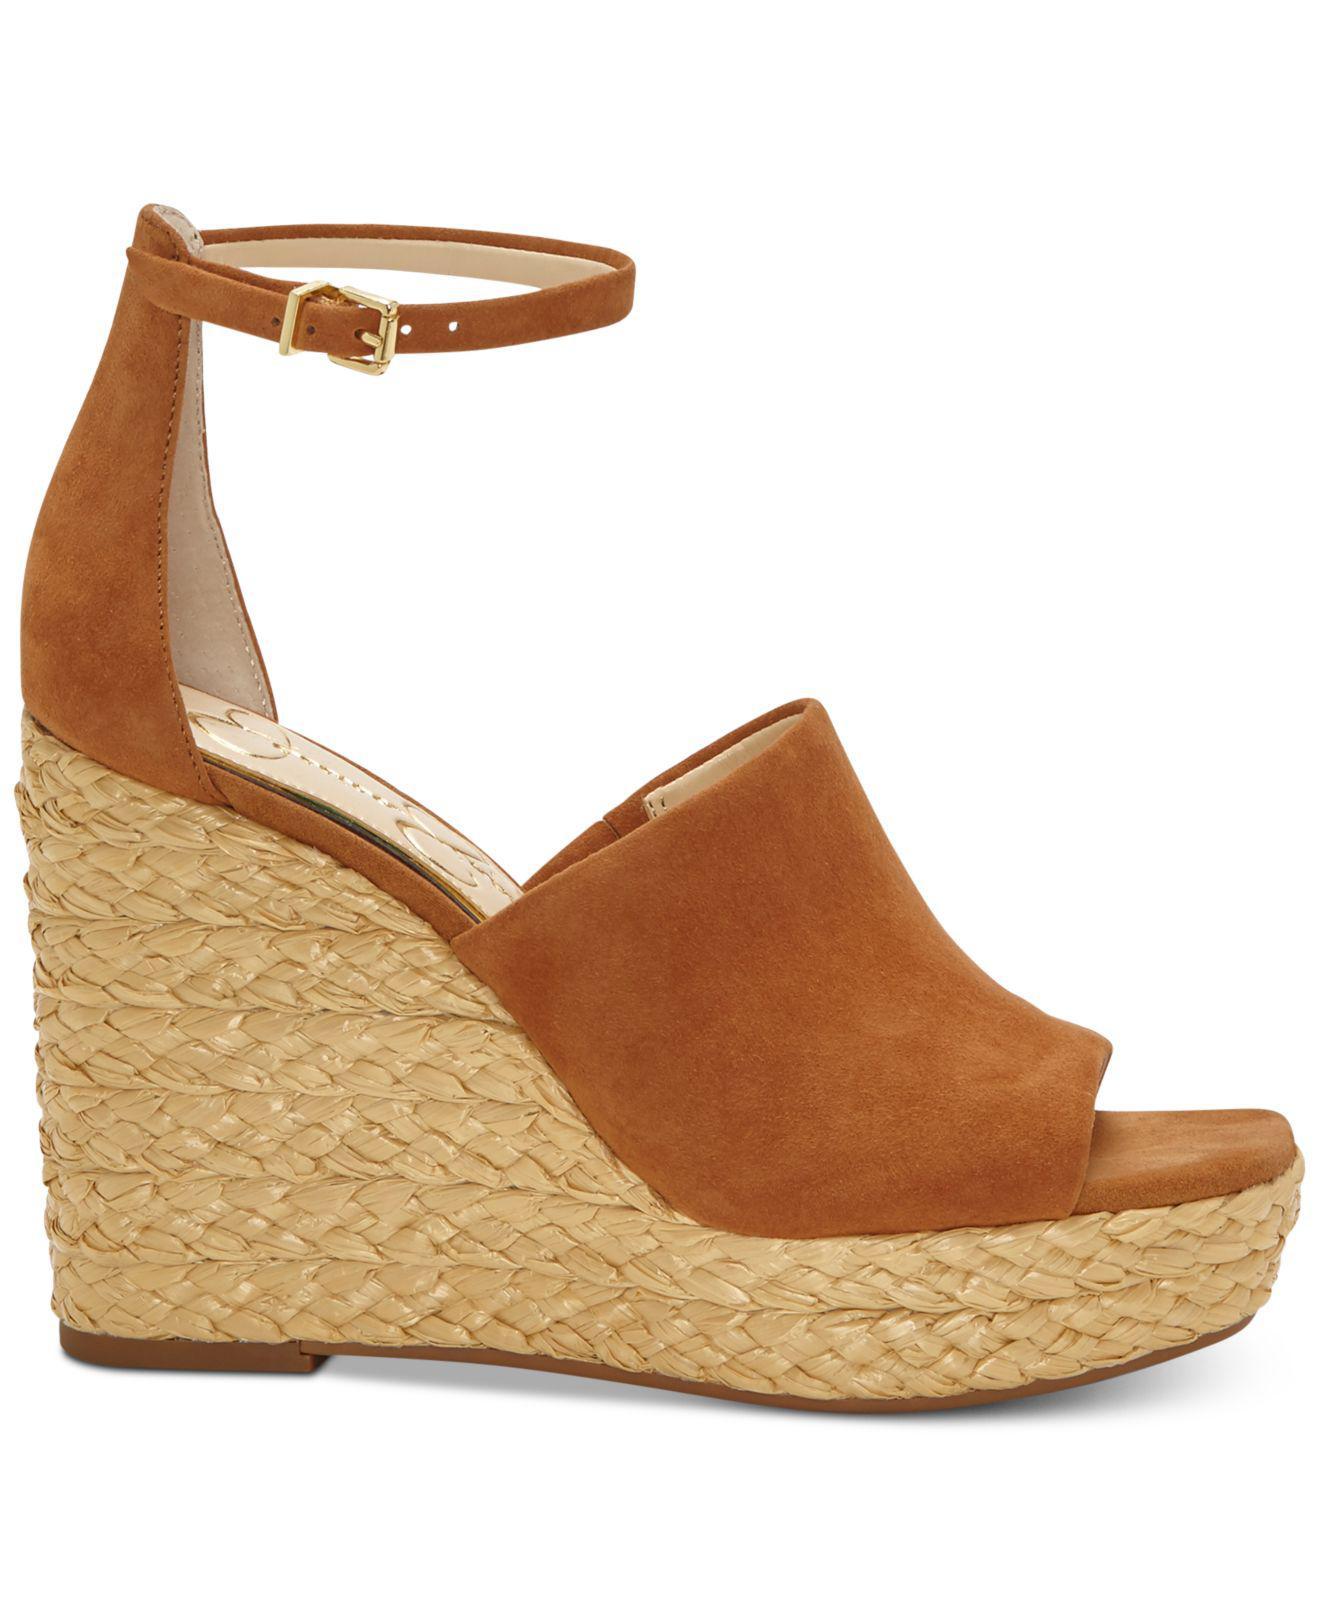 Jessica Simpson ALINDA - High heeled sandals - red/multicolor/suntan 2yE974Wu